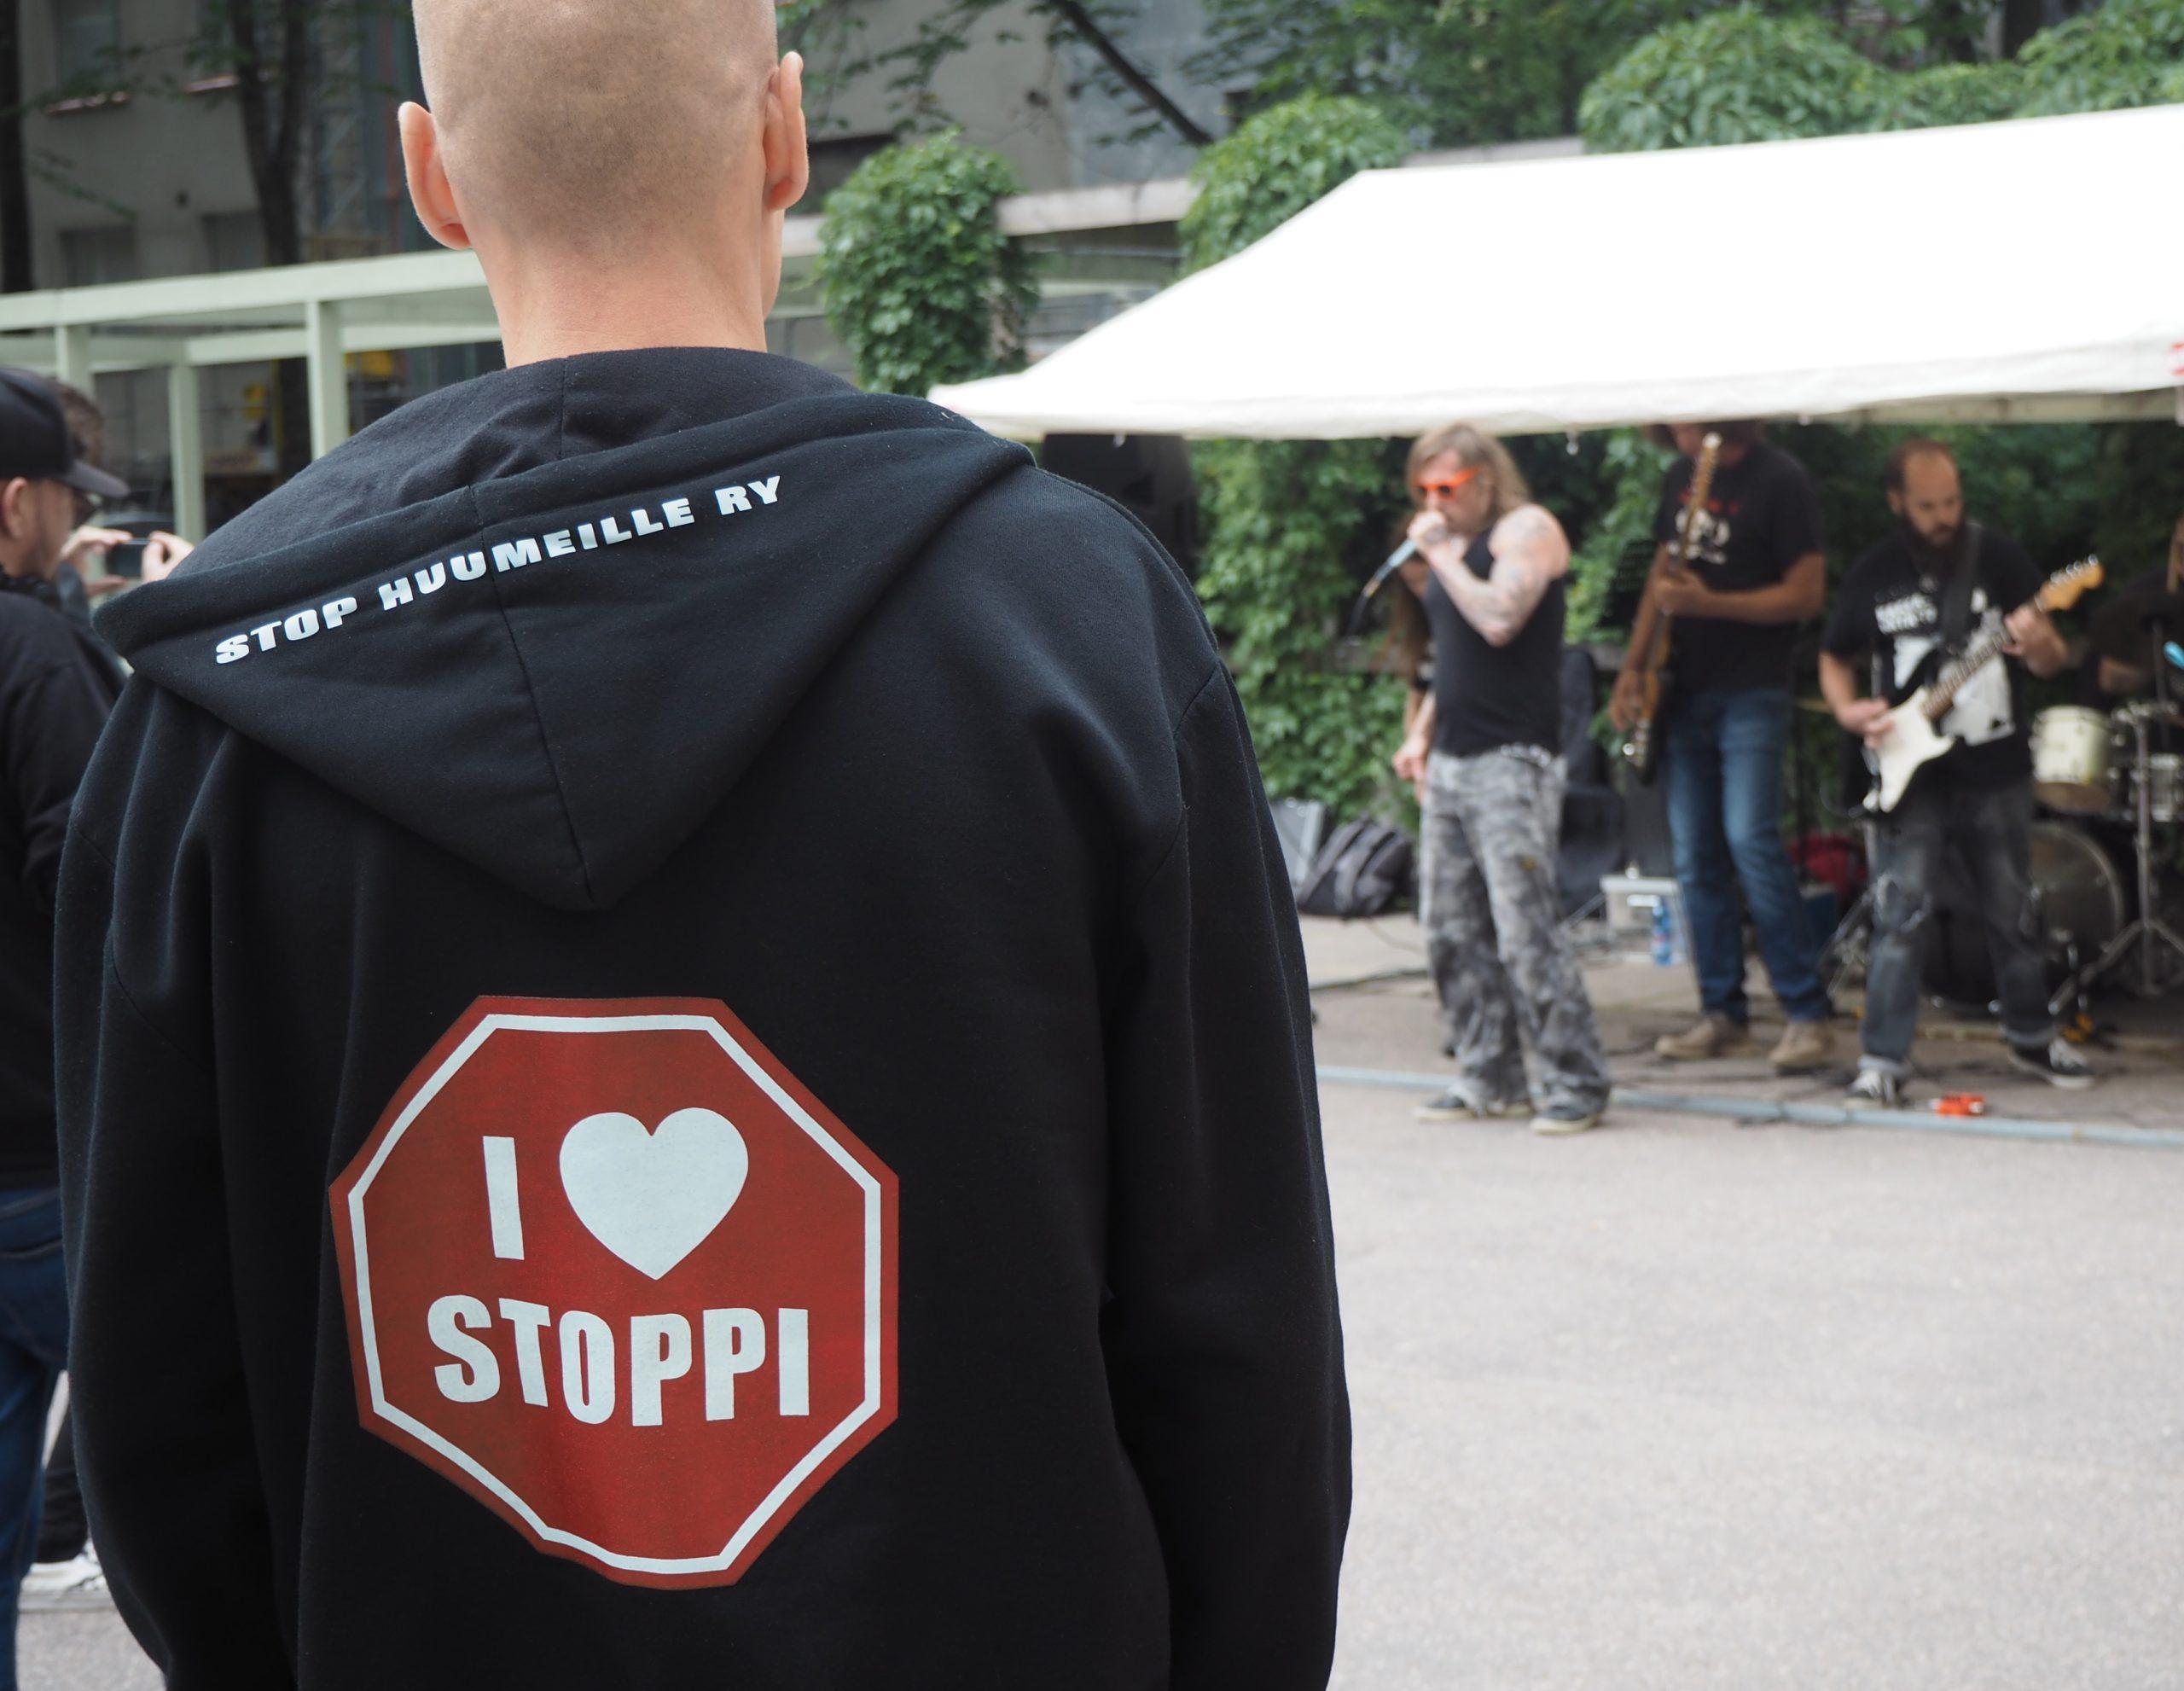 Stop Huumeille